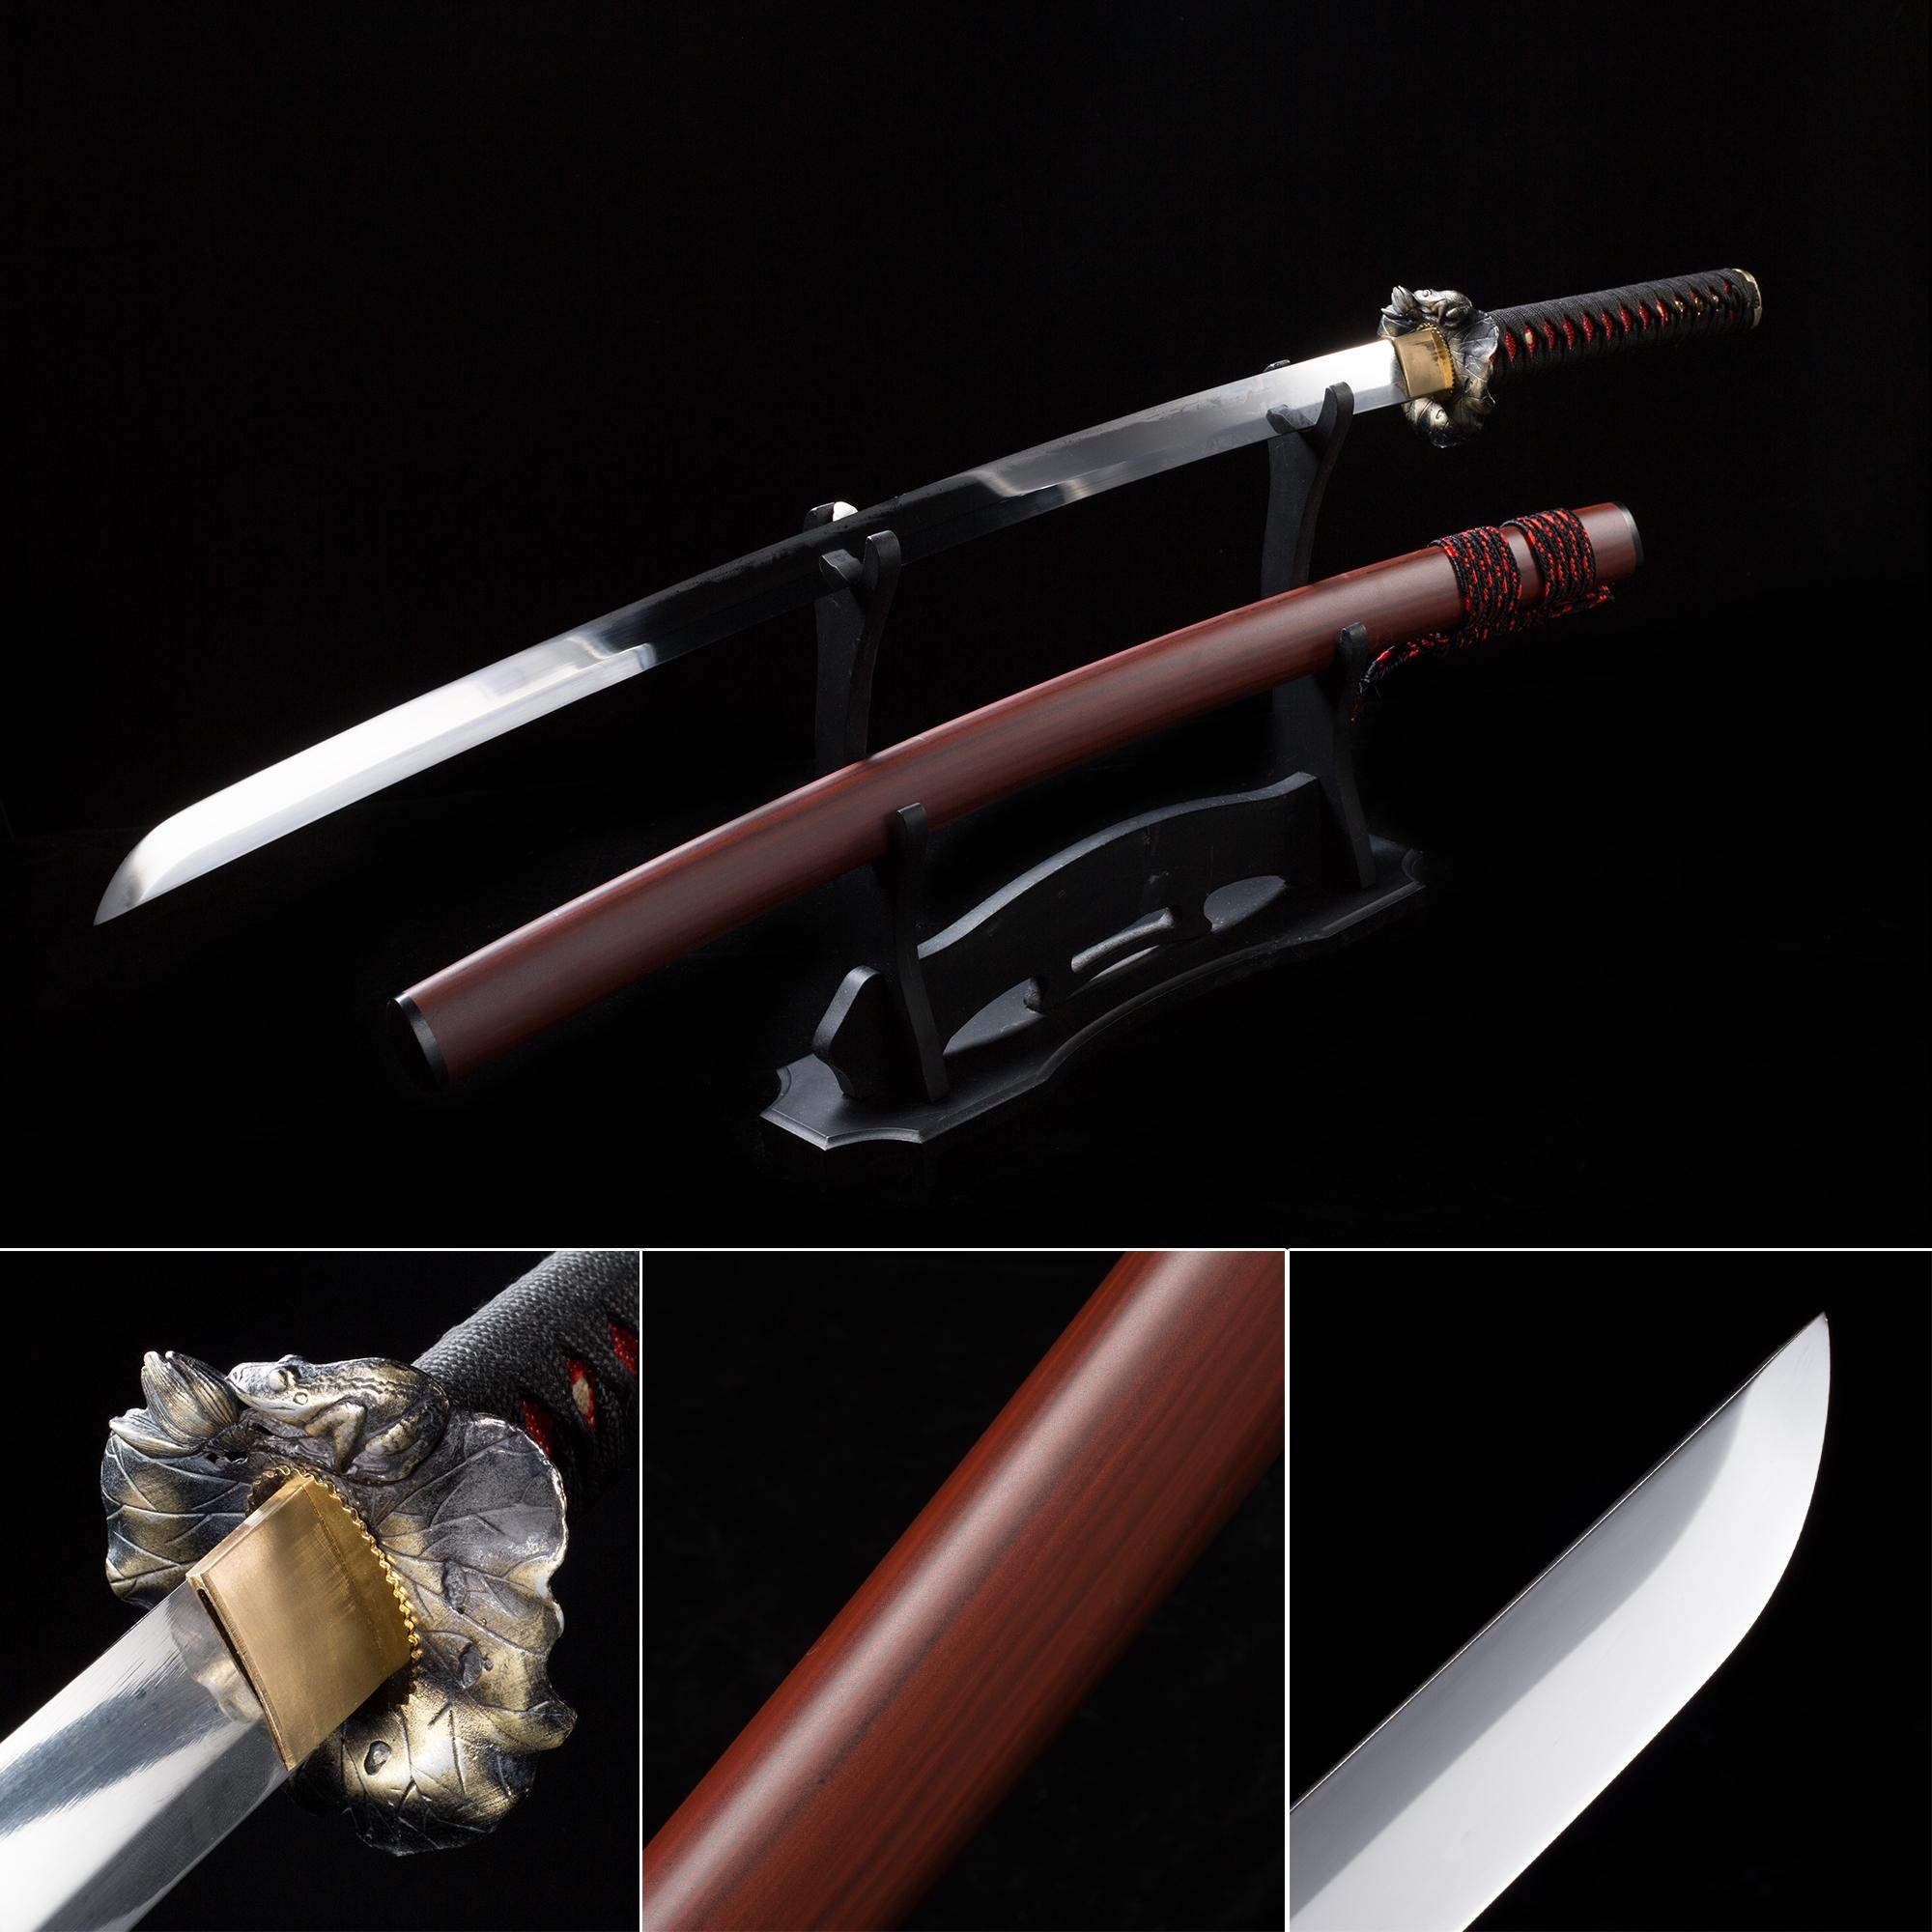 Handmade High Manganese Steel Leaf Tsuba Real Japanese Samurai Katana Sword With Red Scabbard